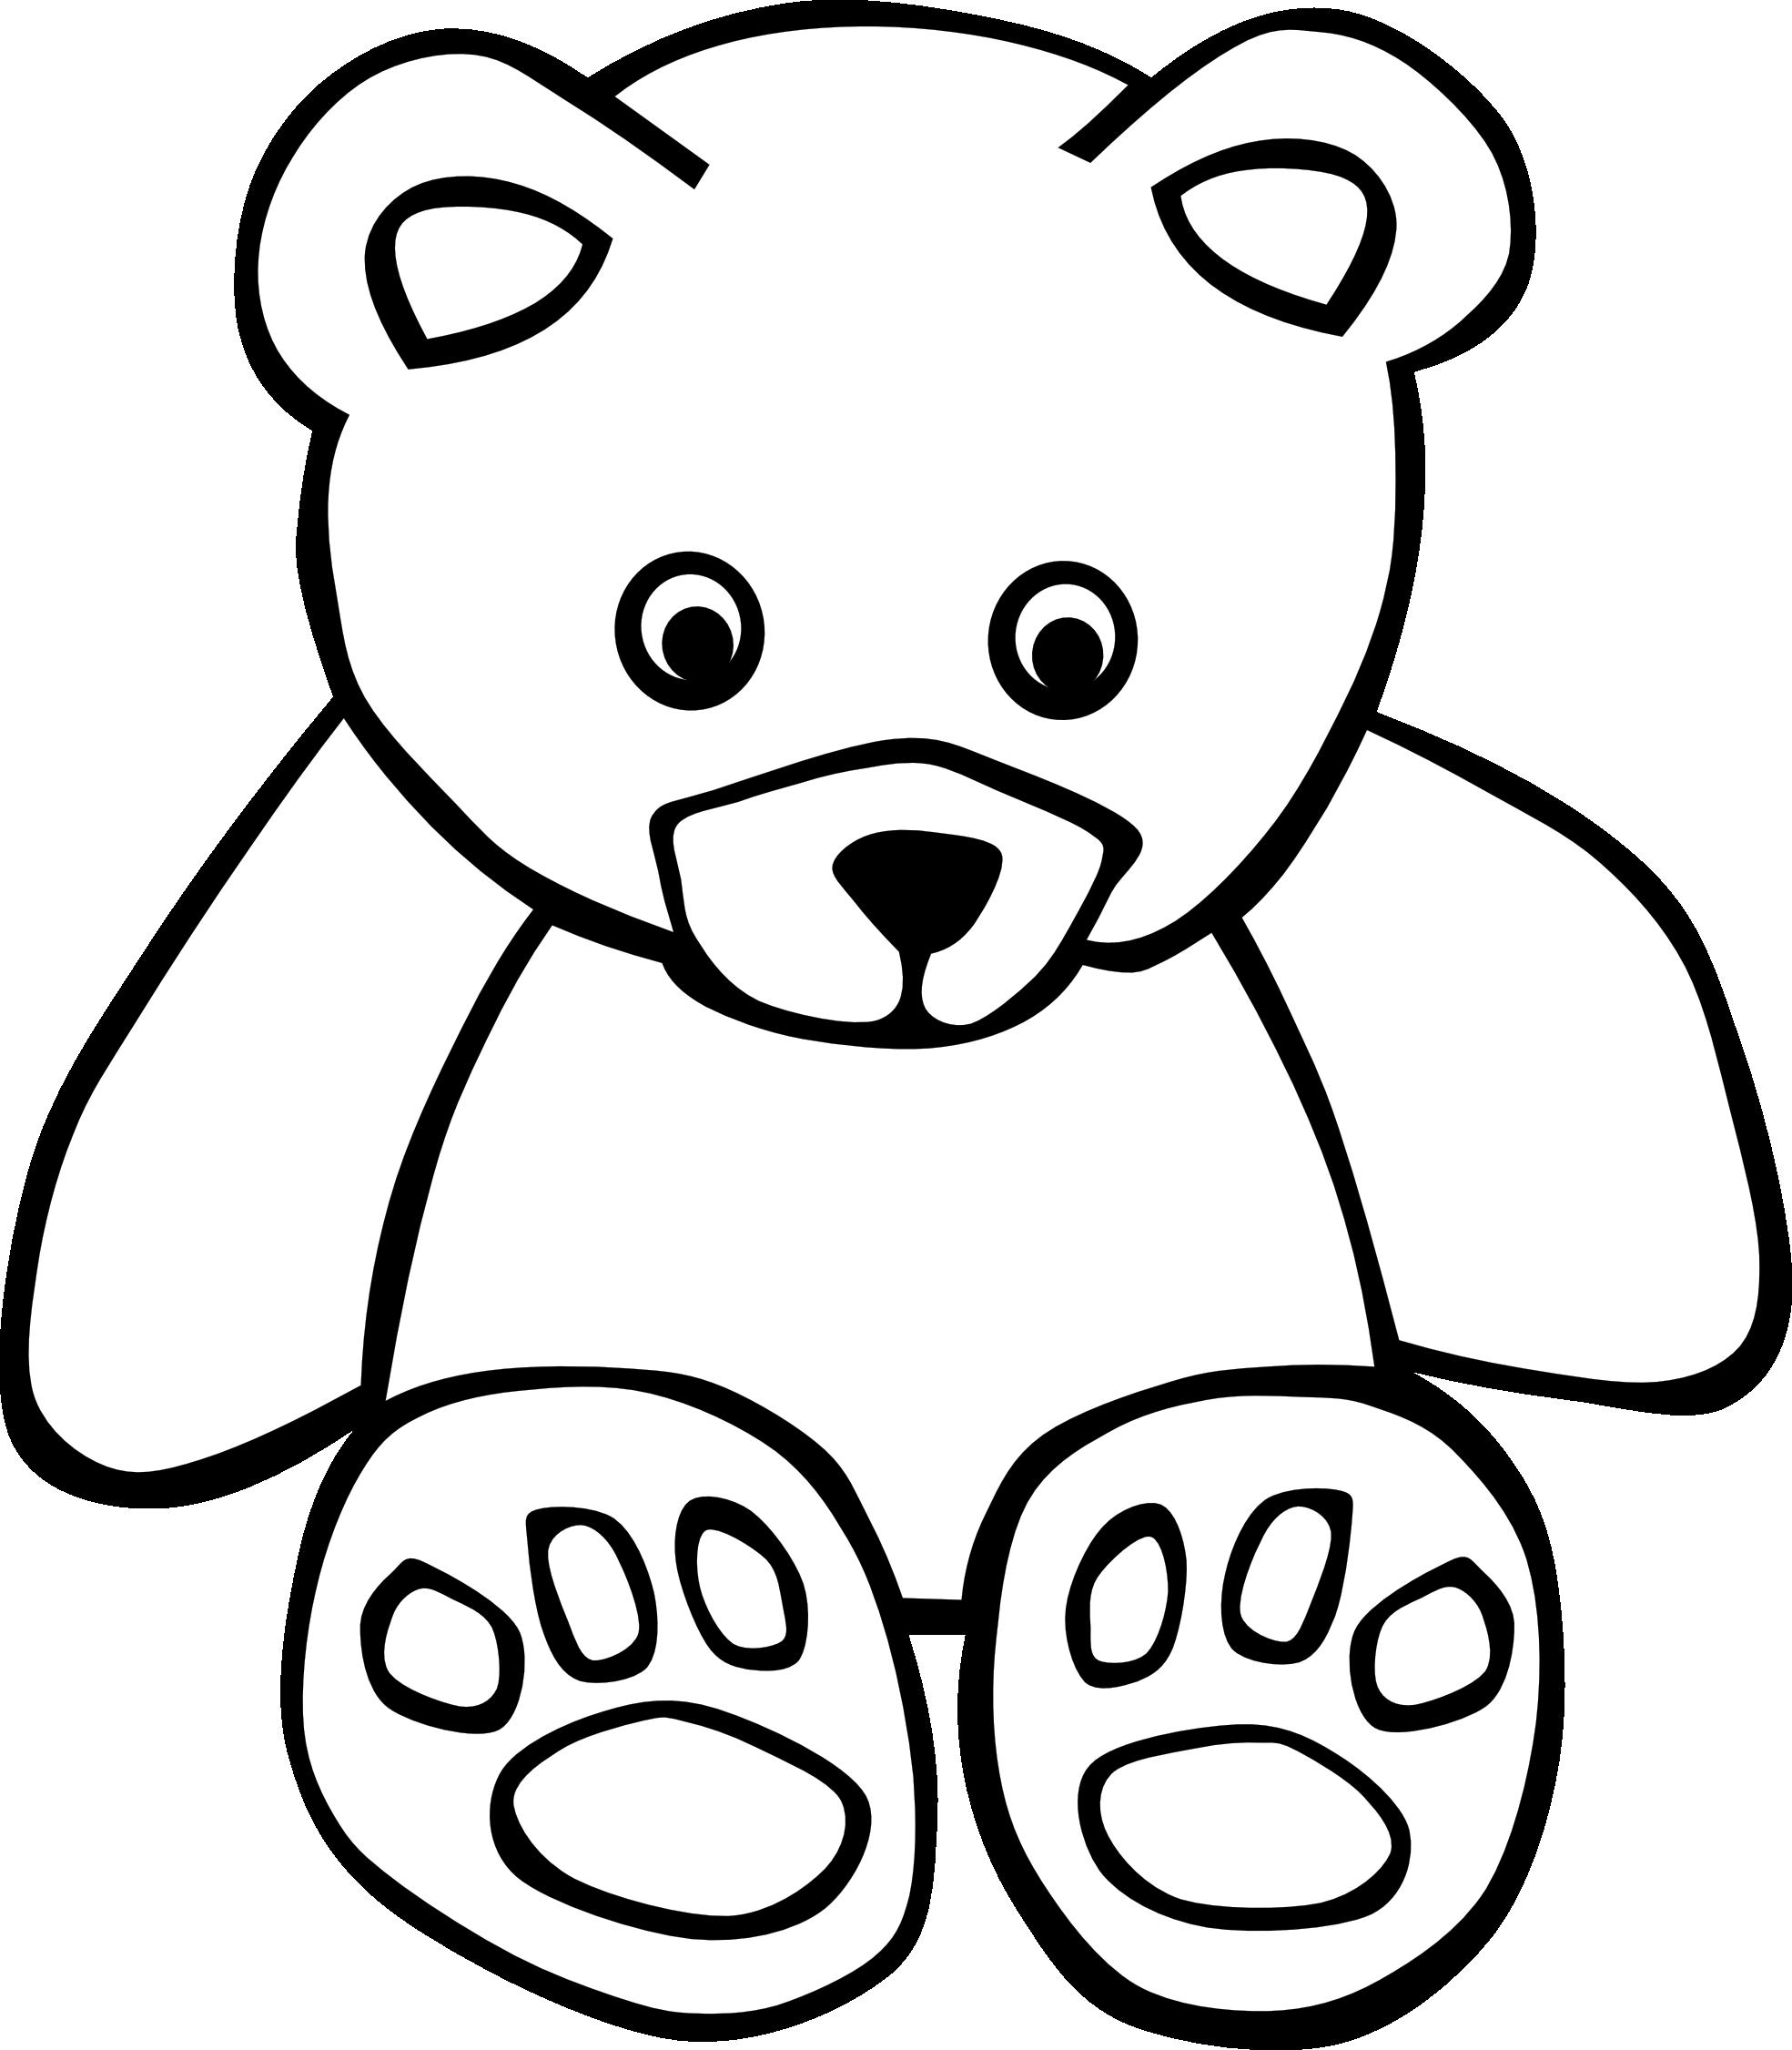 Teddy clipart stuffed animal #5